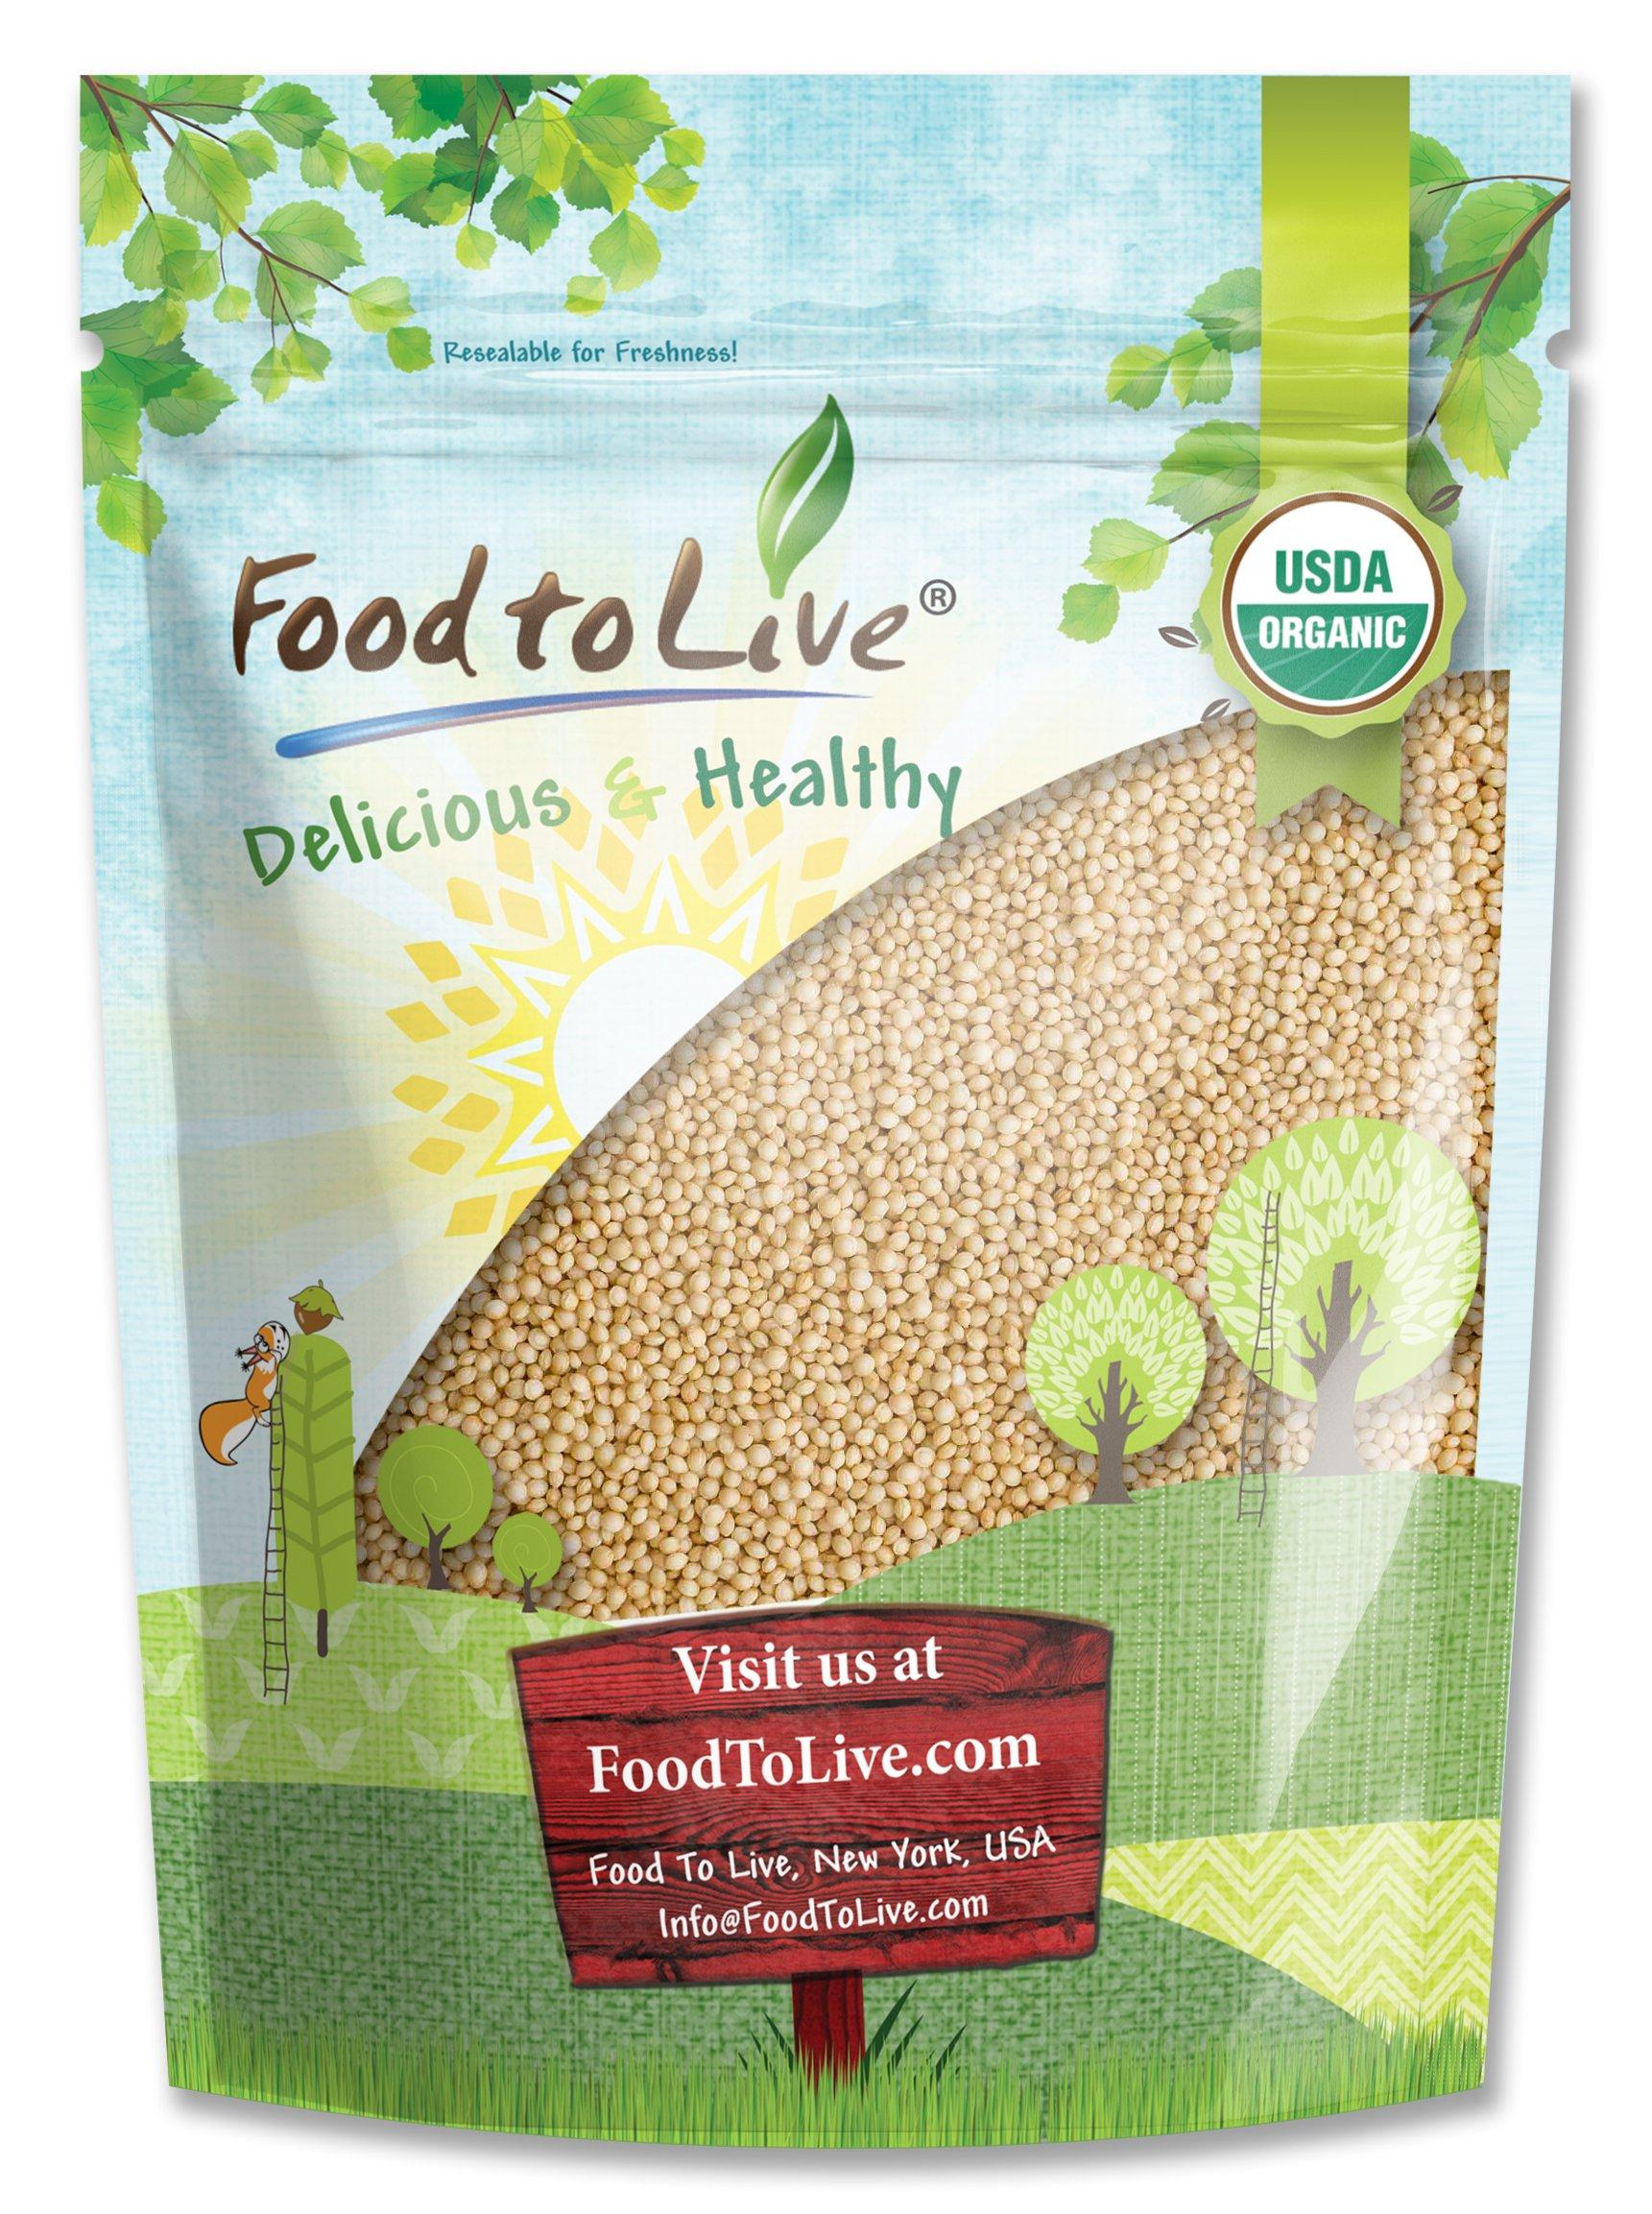 Organic Amaranth Grain, 3 Pounds - Whole Seeds, Non-GMO, Kosher, Vegan, Bulk by Food to Live